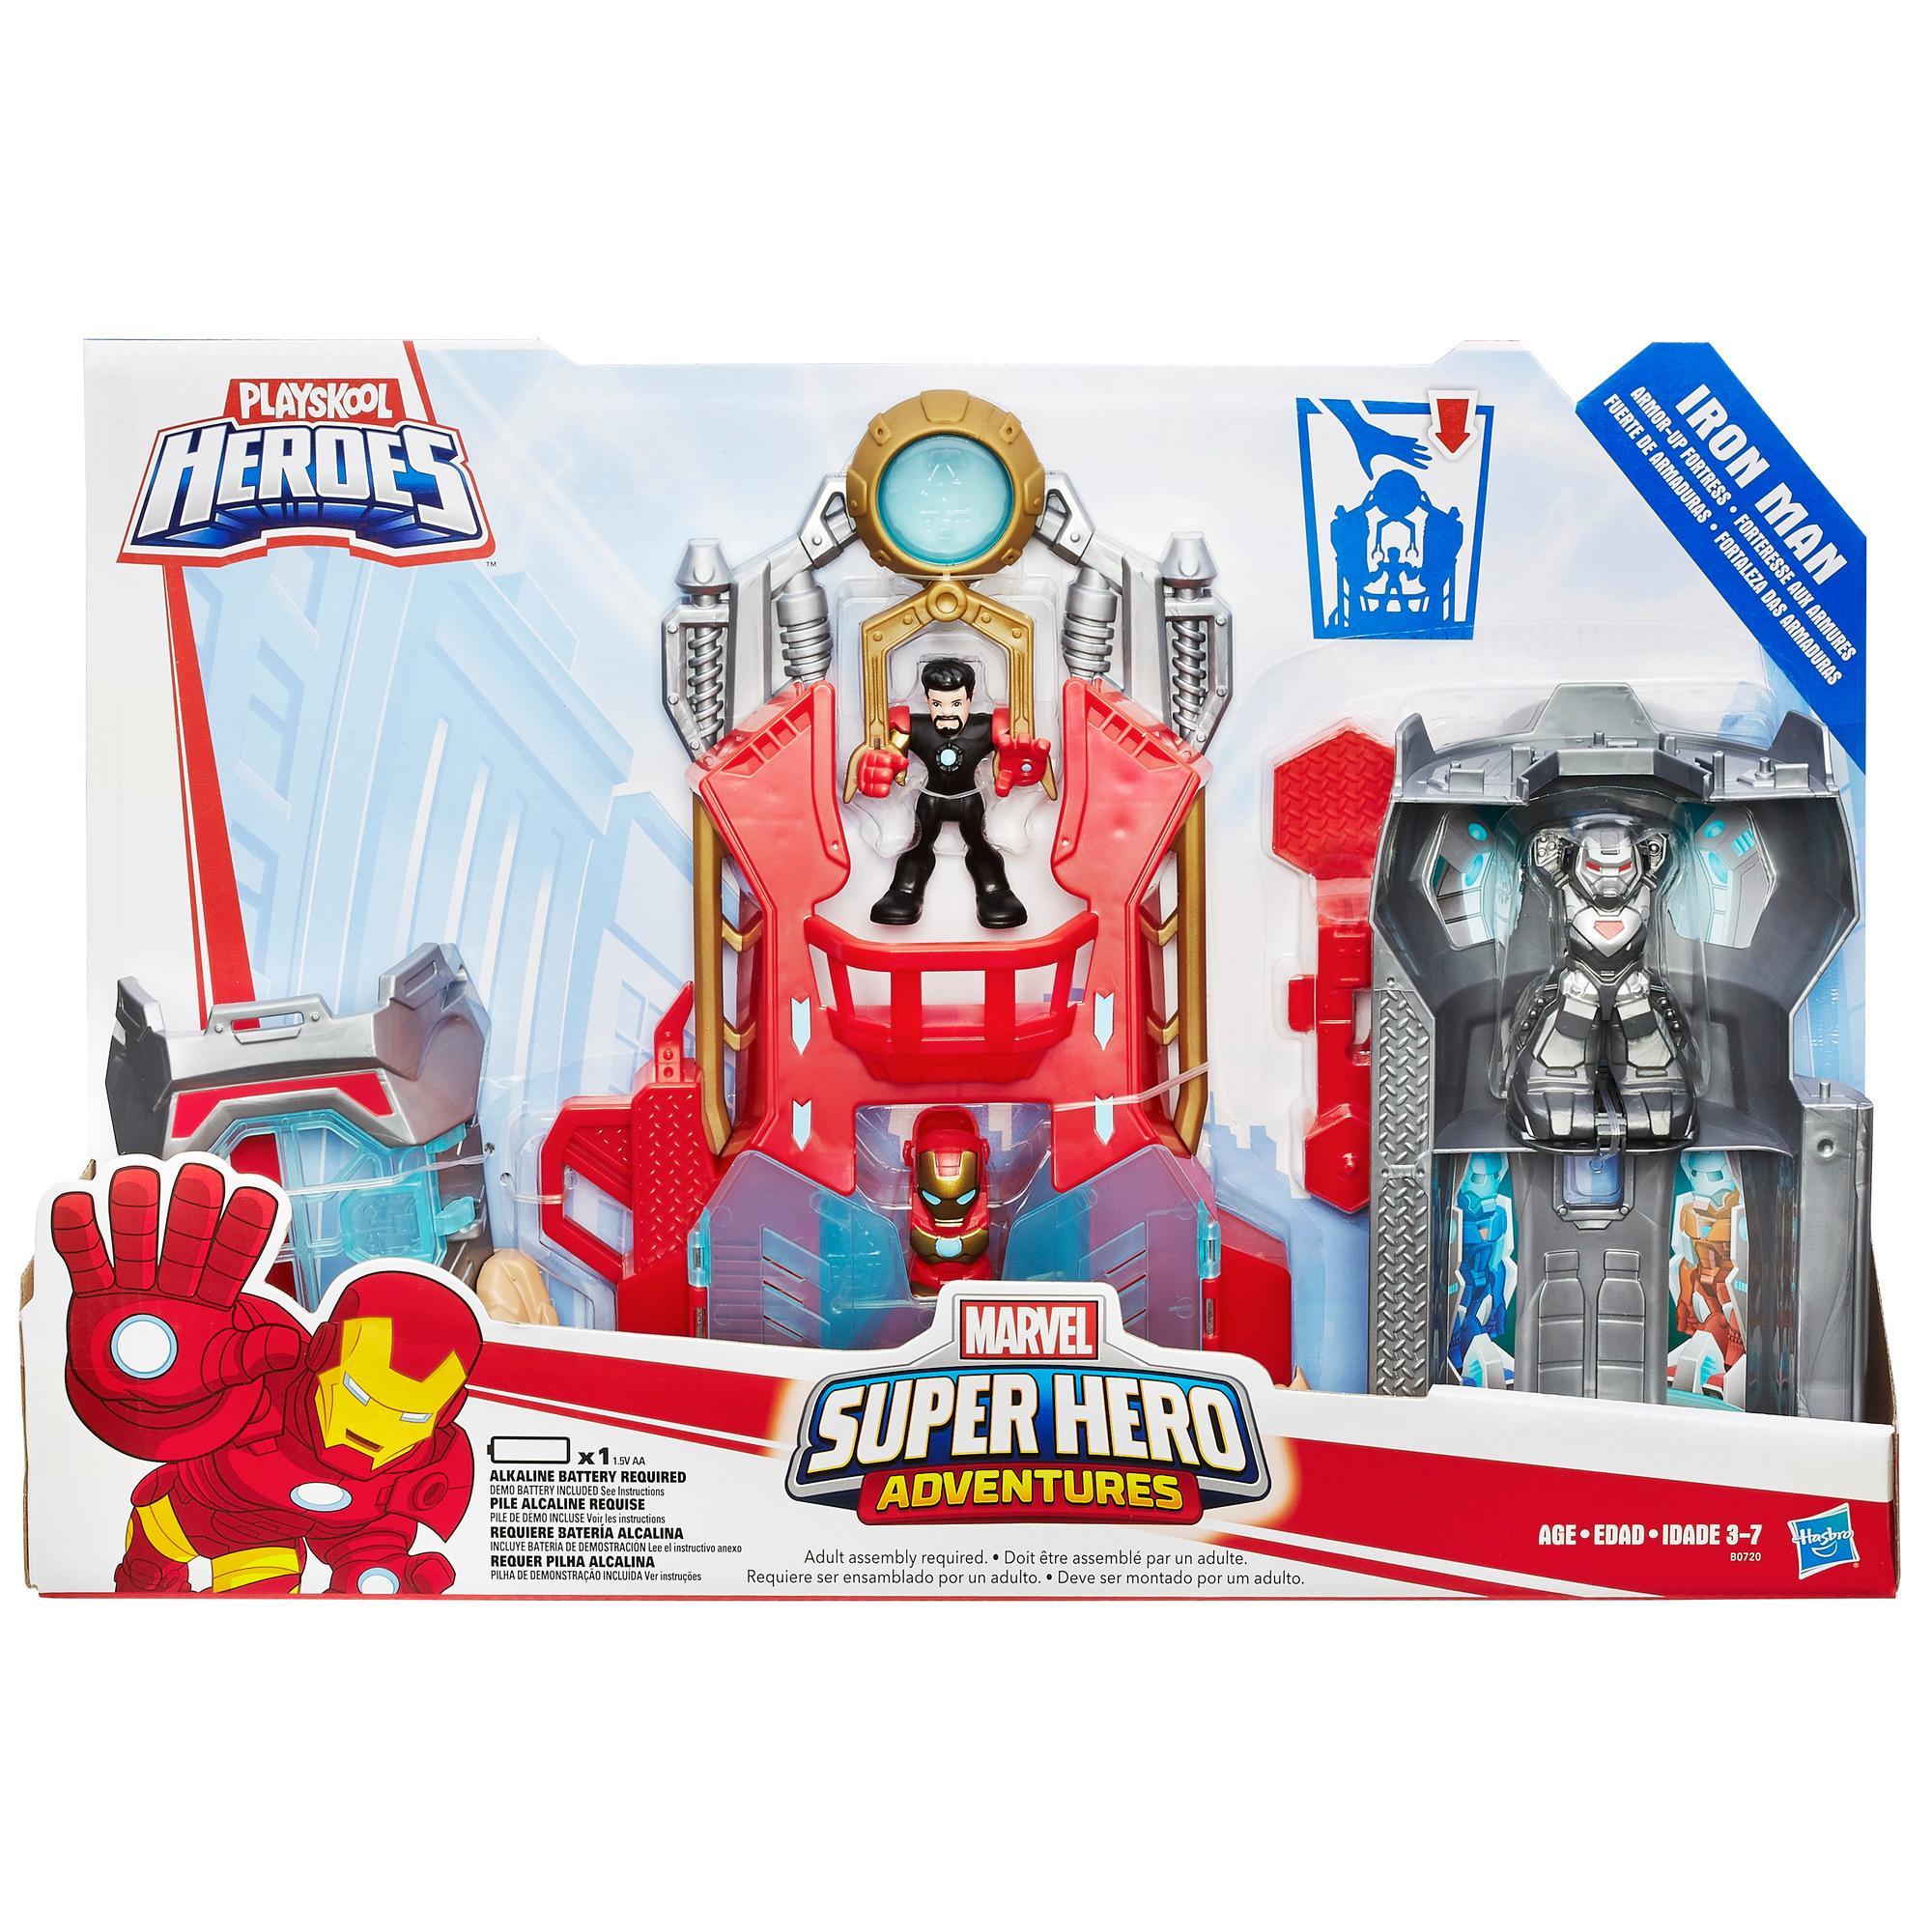 Toys And Adventures : Amazon playskool heroes marvel super hero adventures